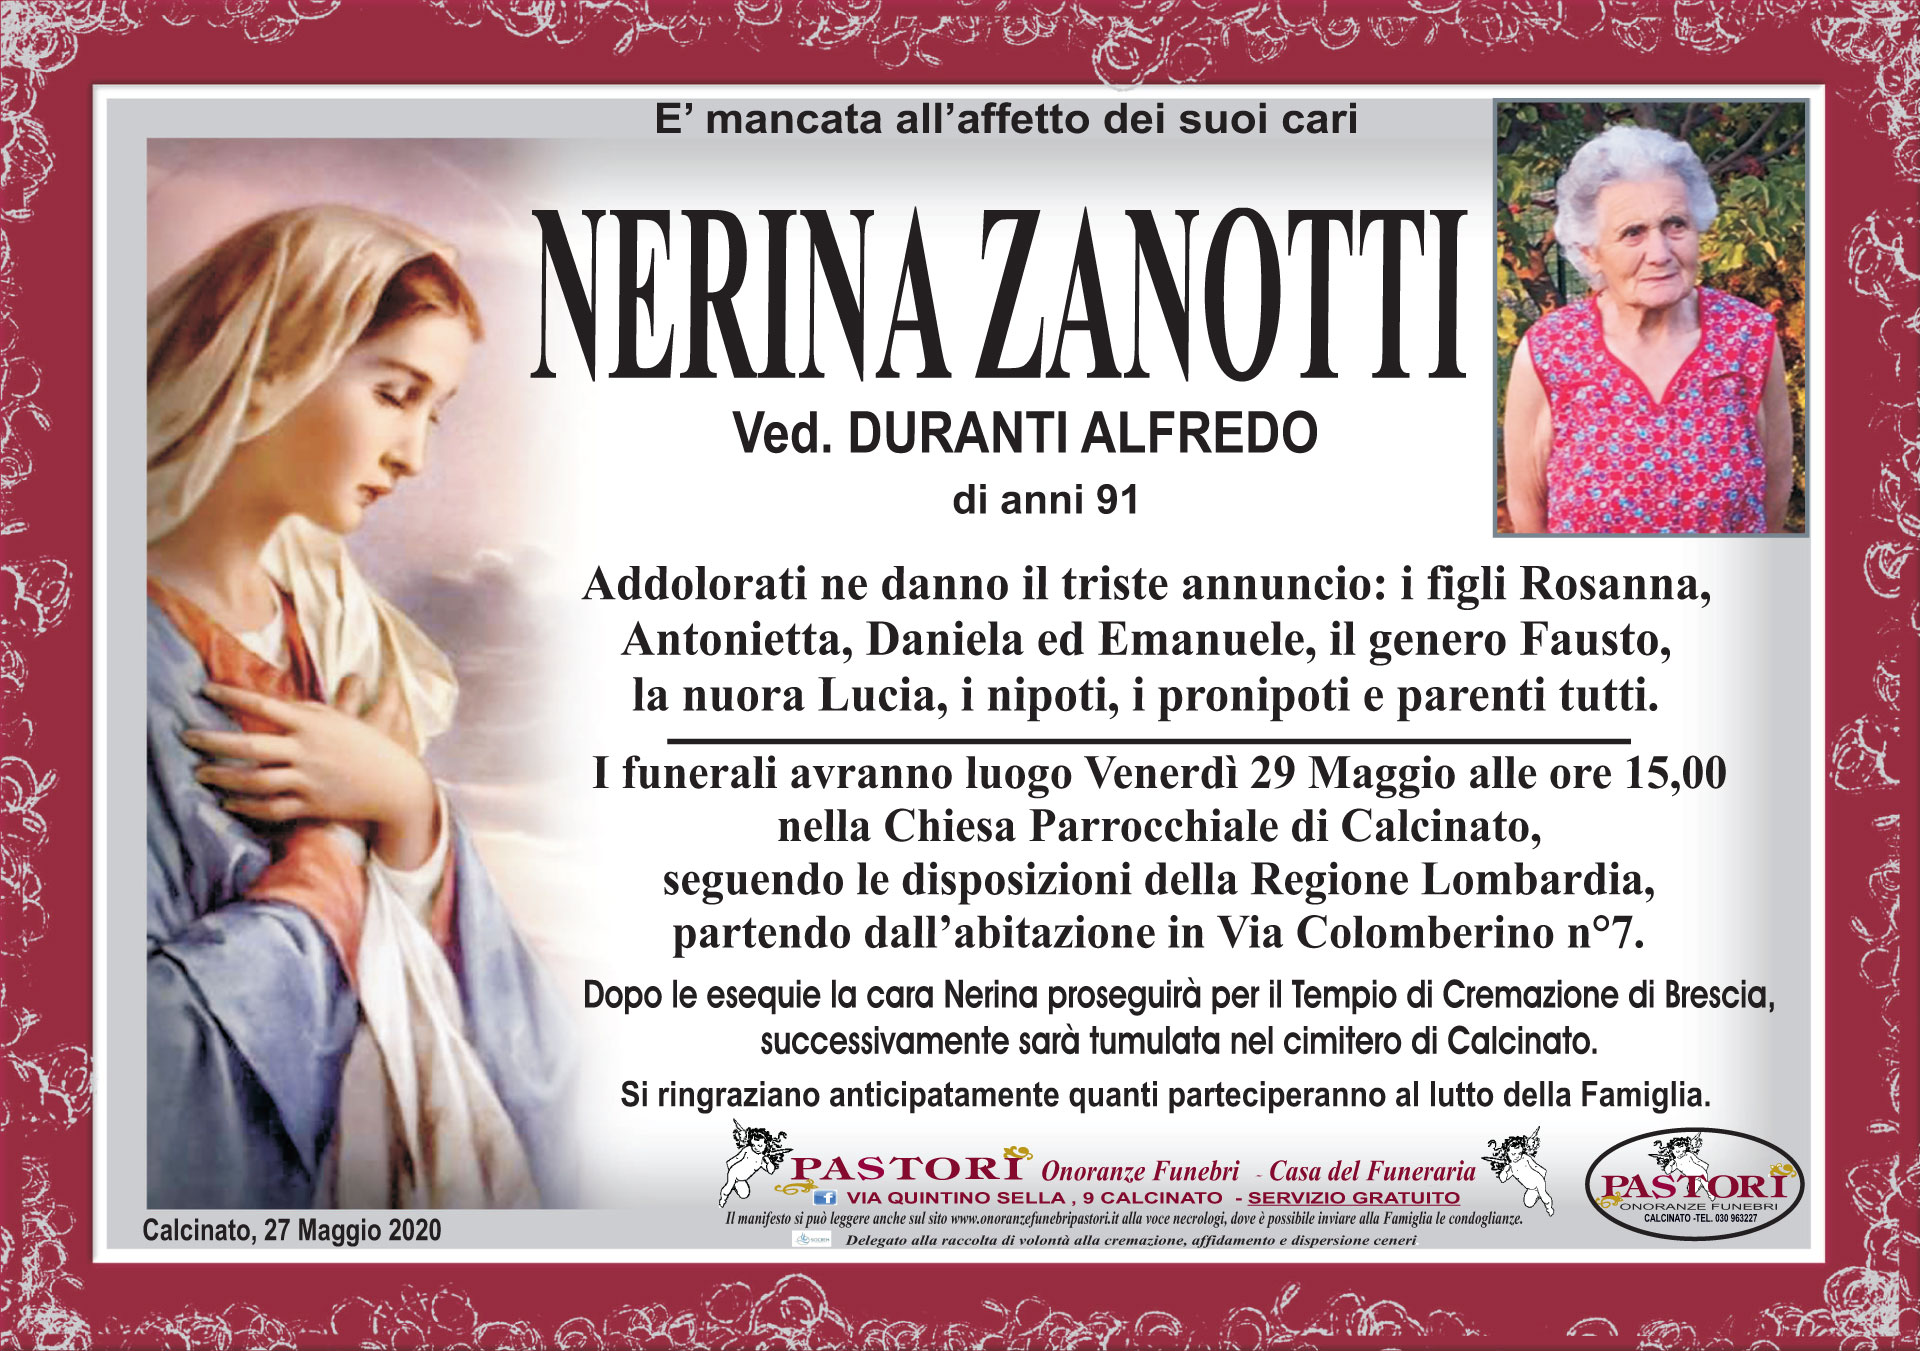 Nerina Zanotti